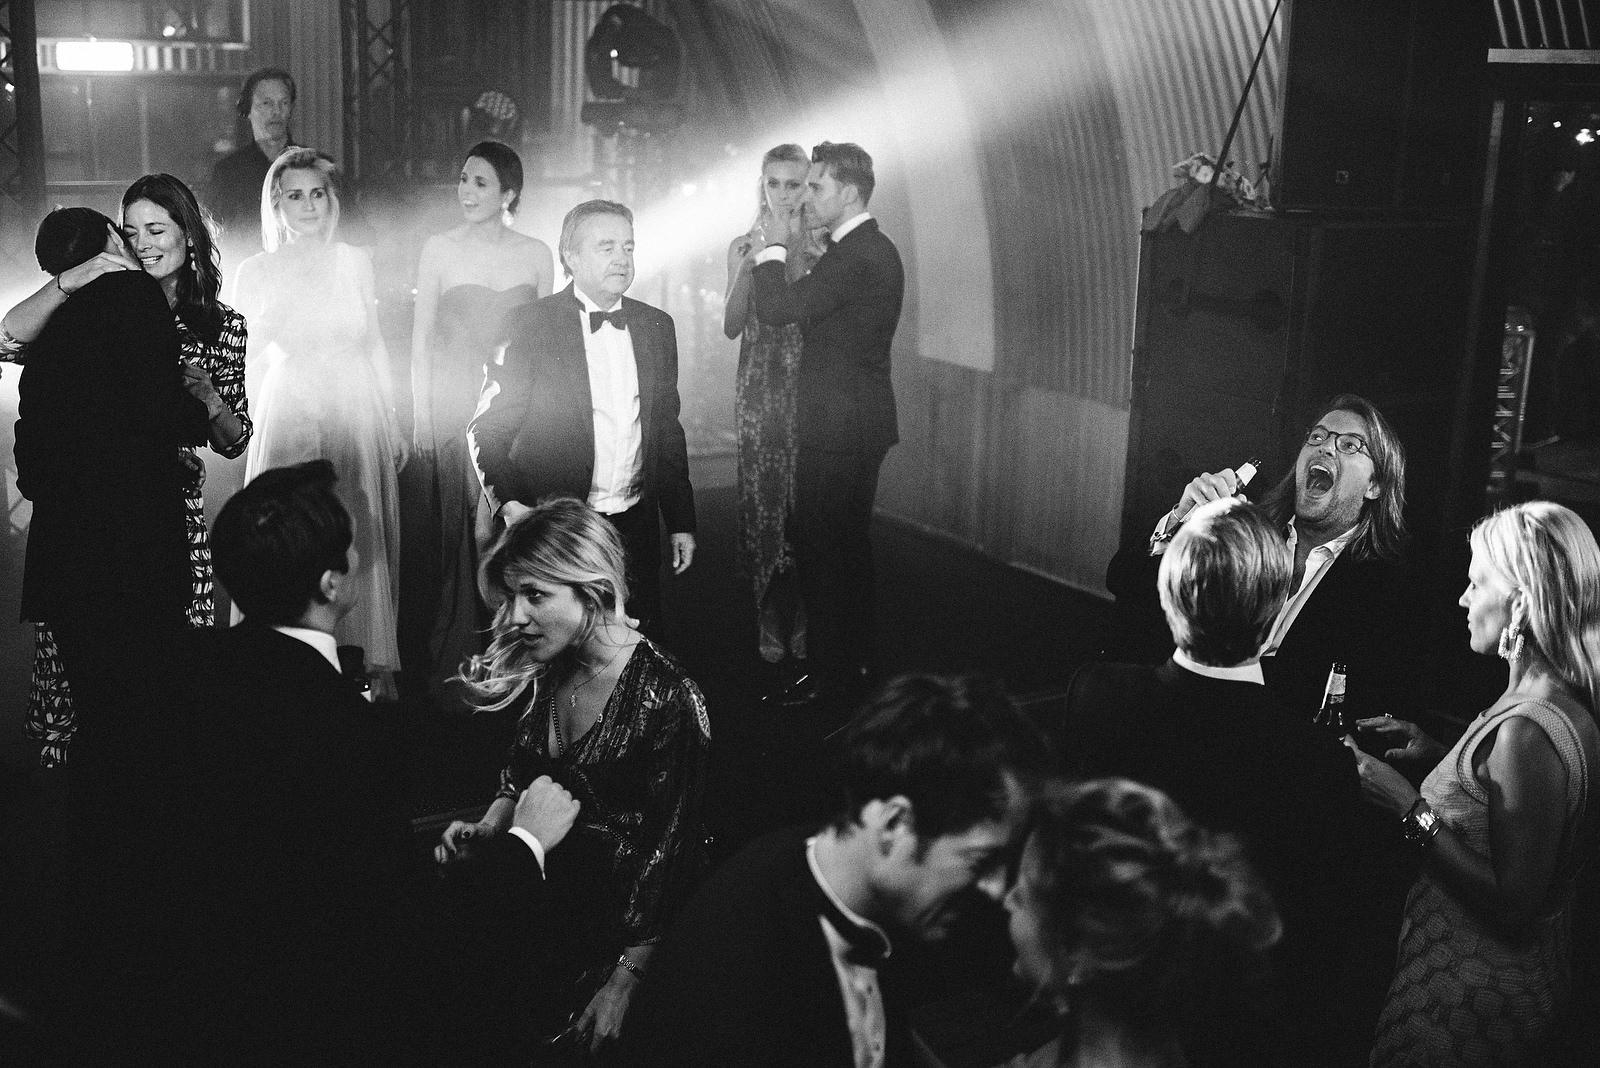 Fotograf Konstanz - Destination Wedding Photographer Amsterdam 139 - Destination Wedding Amsterdam  - 241 -